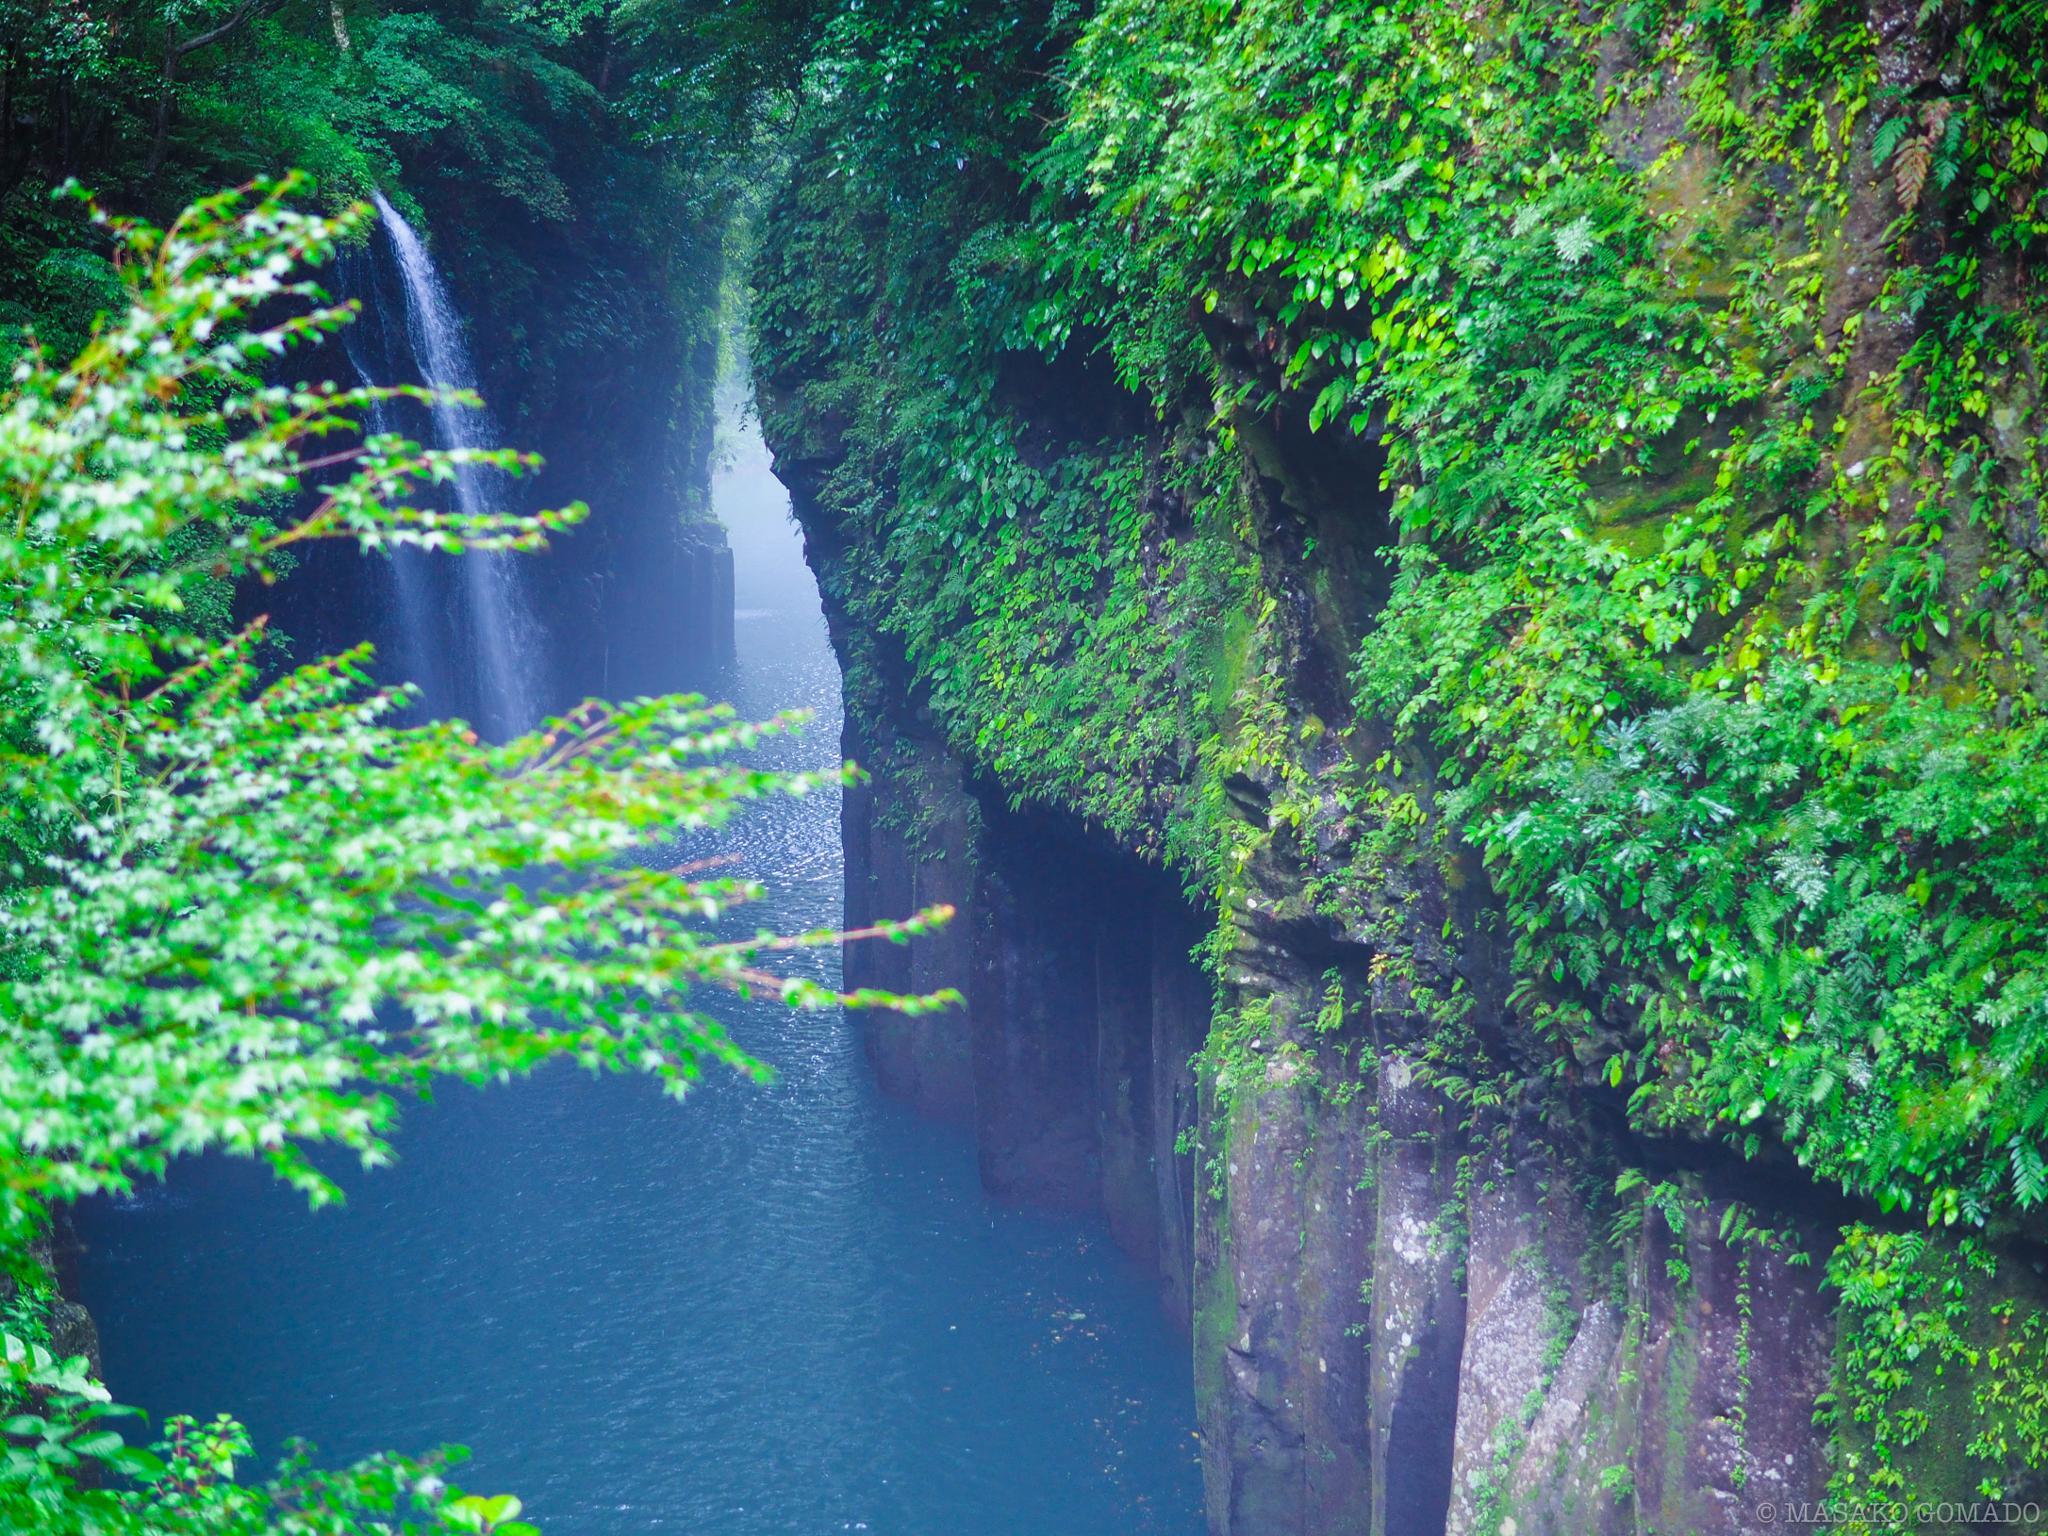 waterfall by Masako Gomado